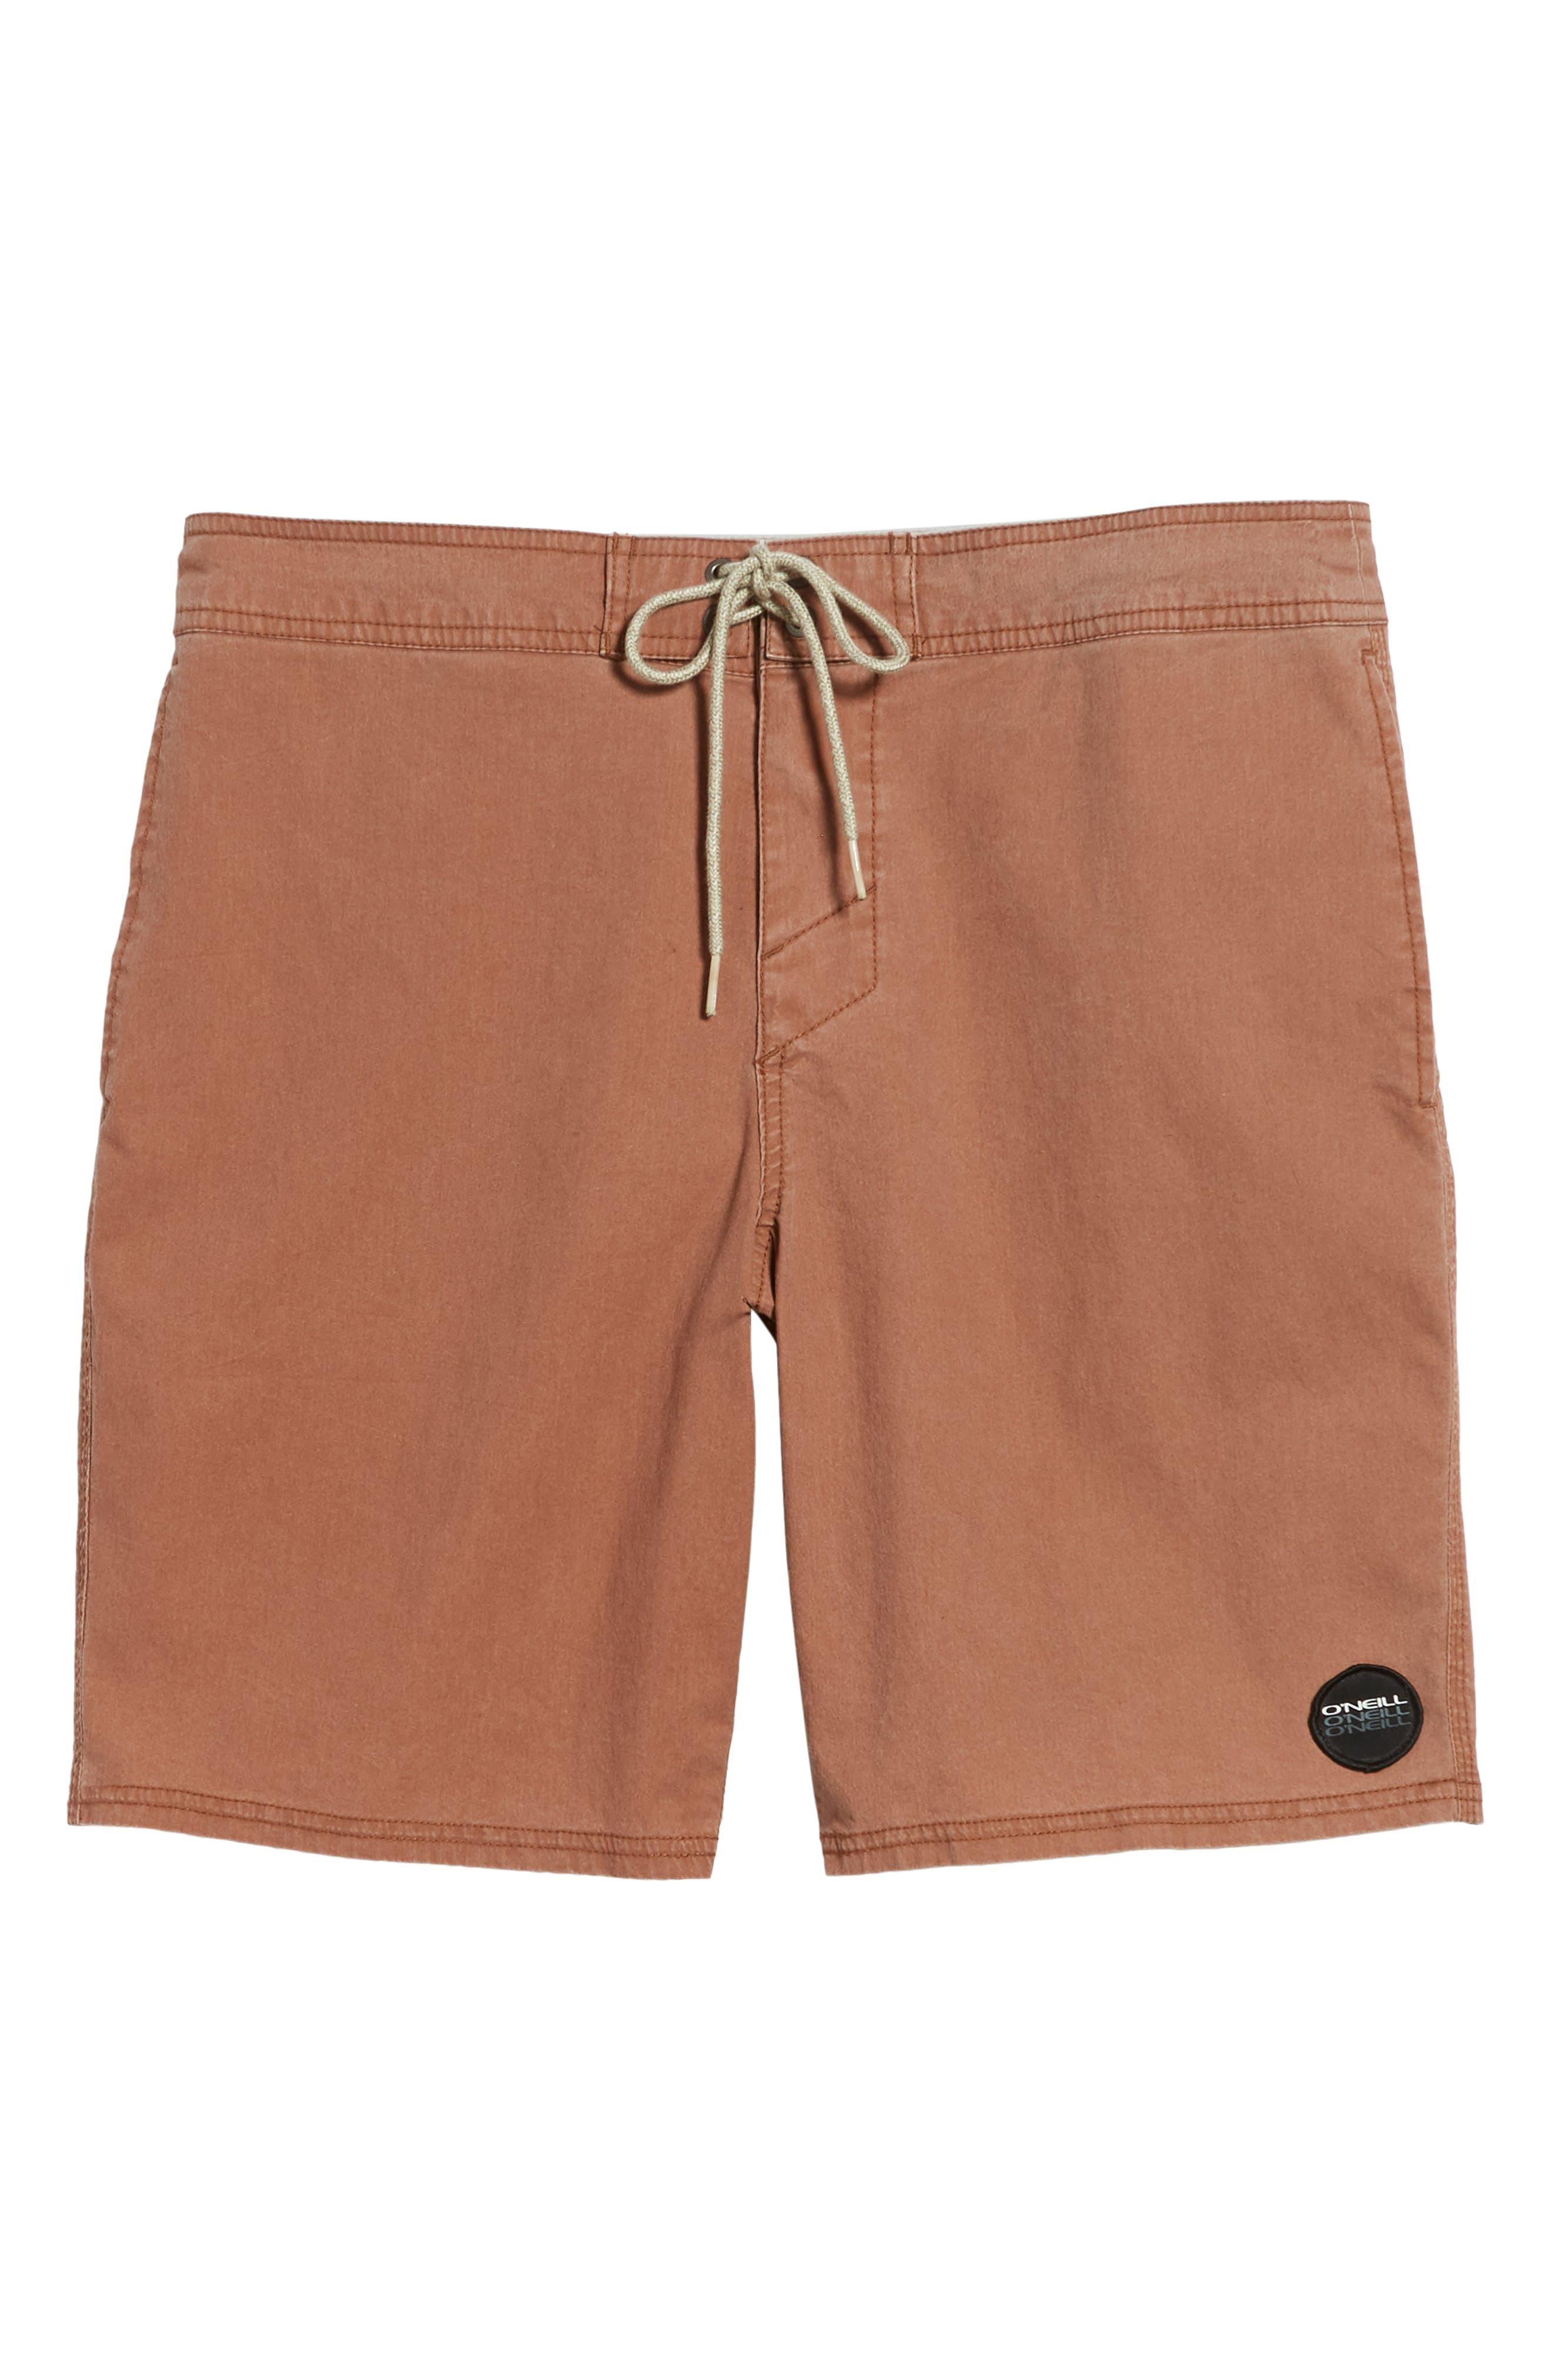 Faded Cruzer Board Shorts,                             Alternate thumbnail 6, color,